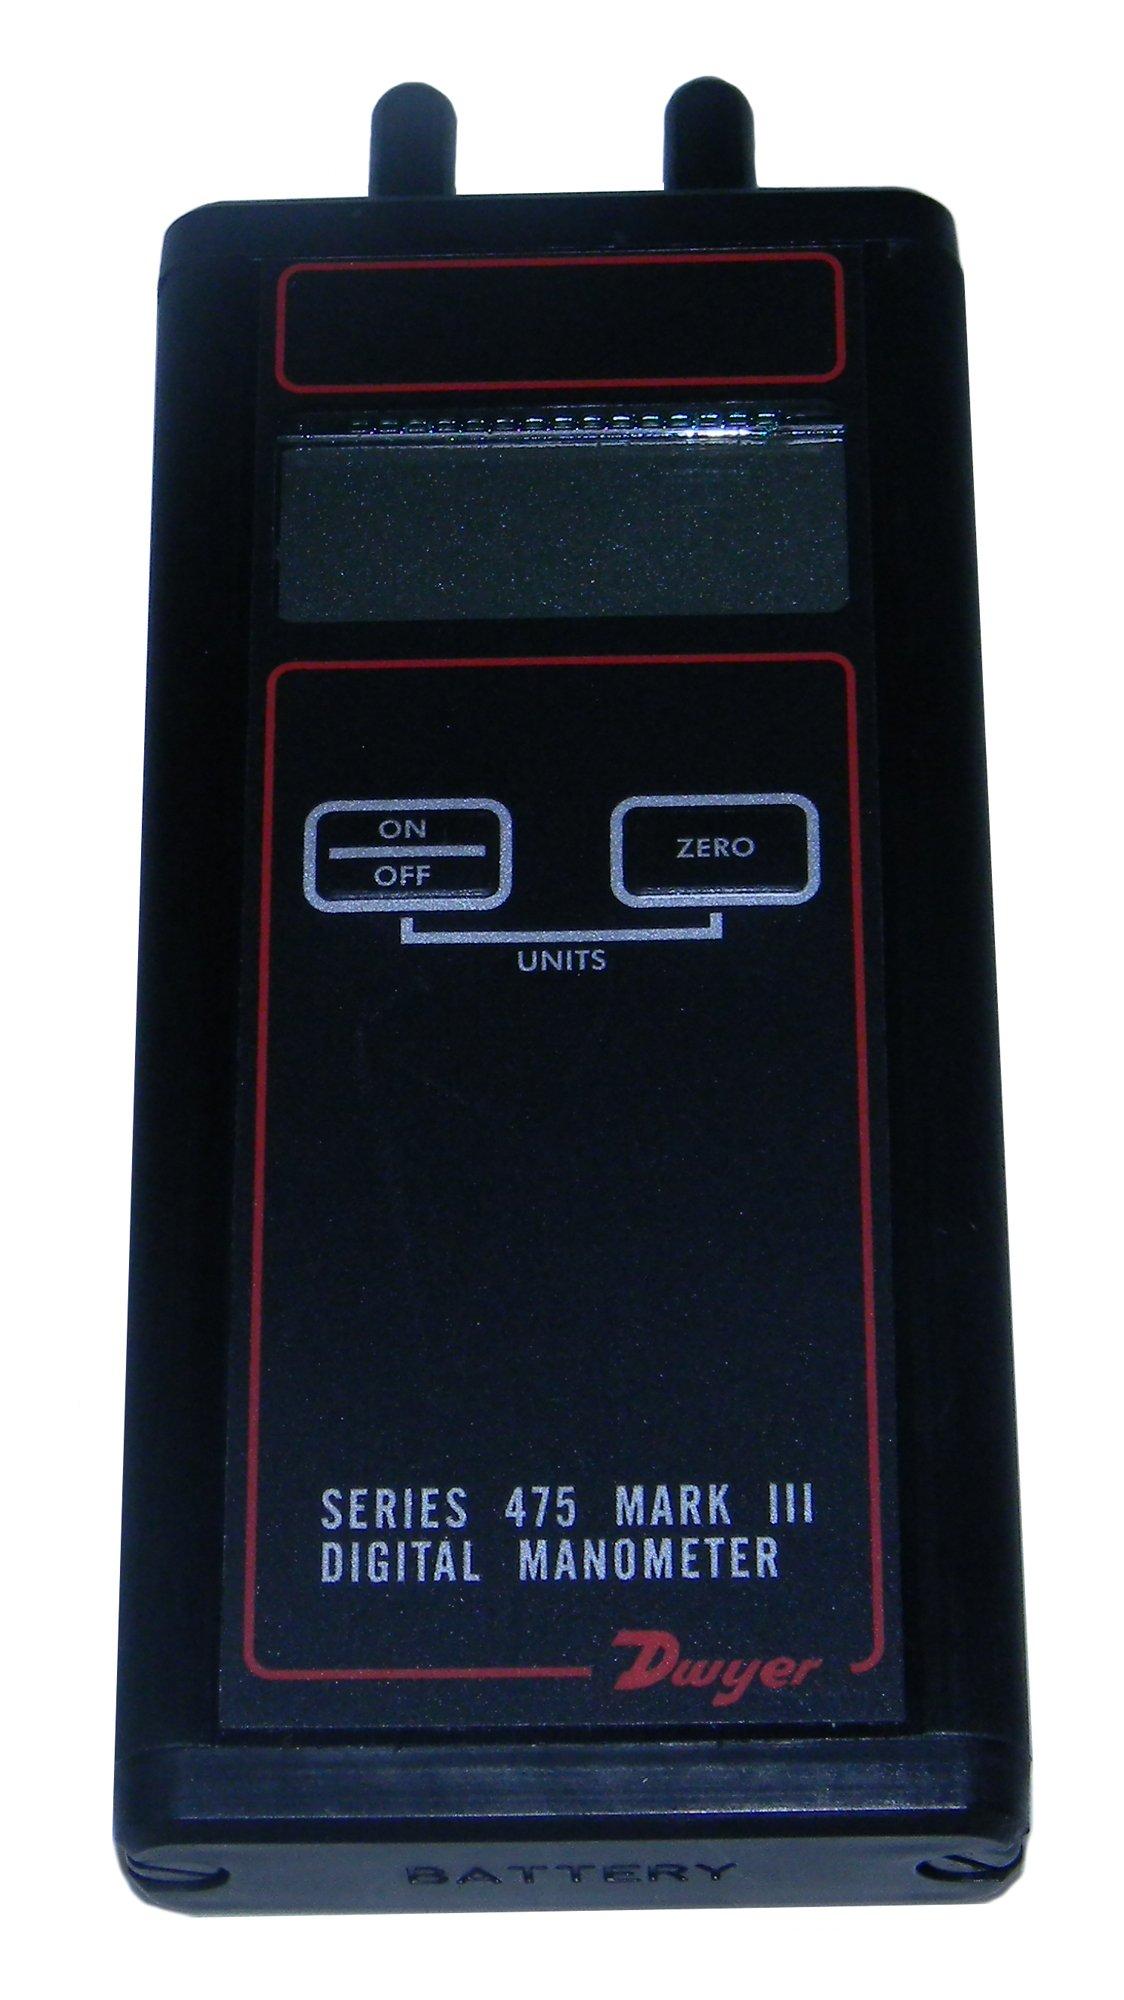 Dwyer Series 475 Mark III Handheld Digital Manometer, 0-40.00''WC Range, 10 psig Maximum Pressure